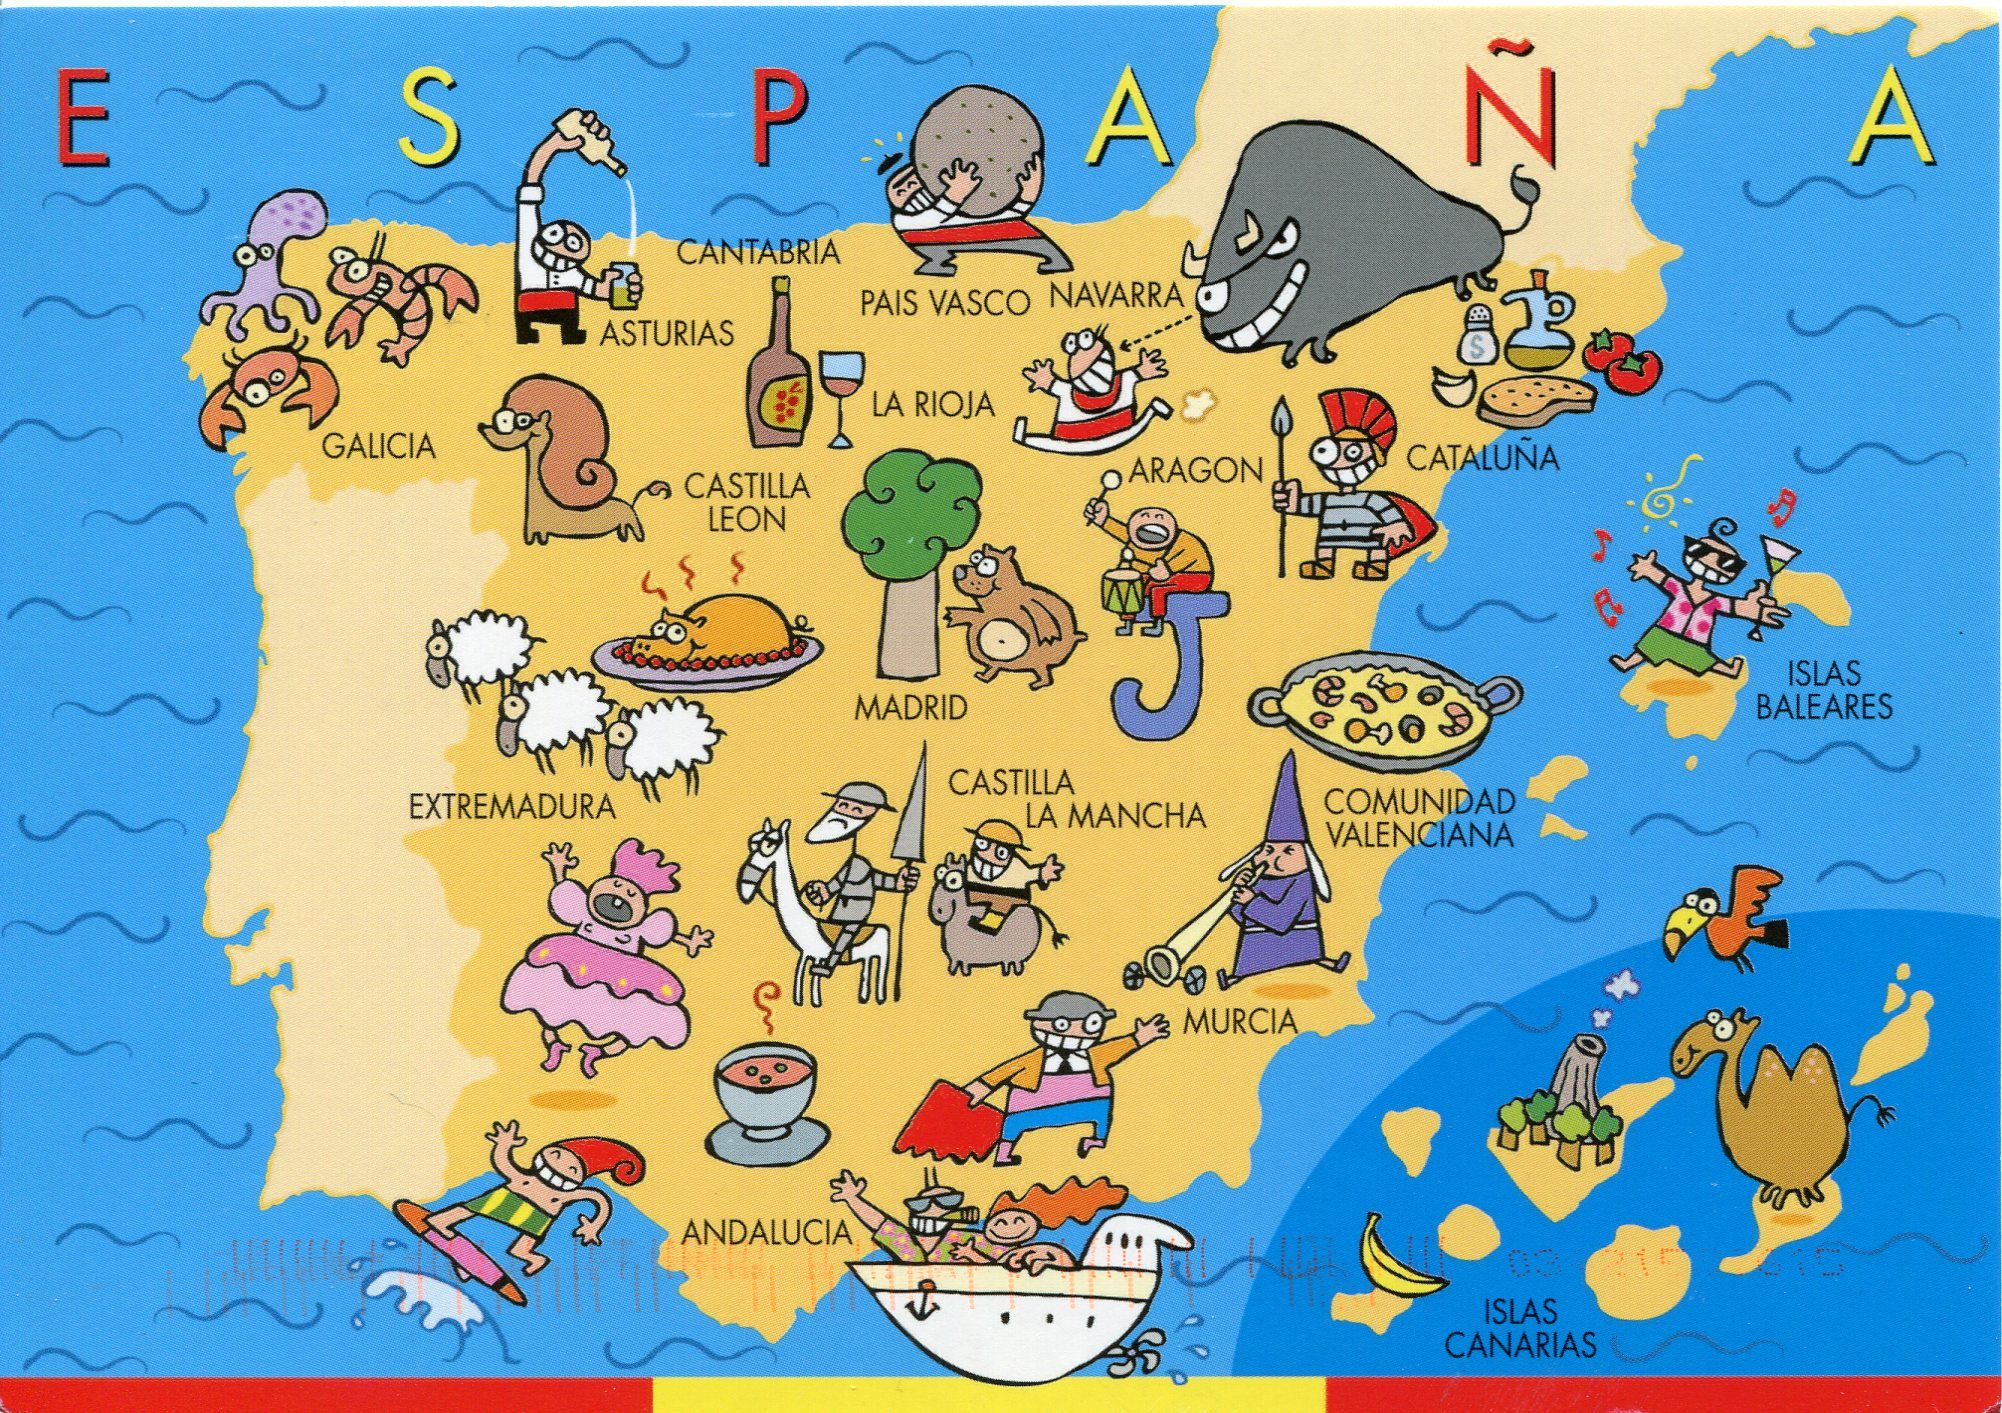 turismo espanha mapa Spain: One Of The World's Top Tourist Destinations | Pinterest  turismo espanha mapa